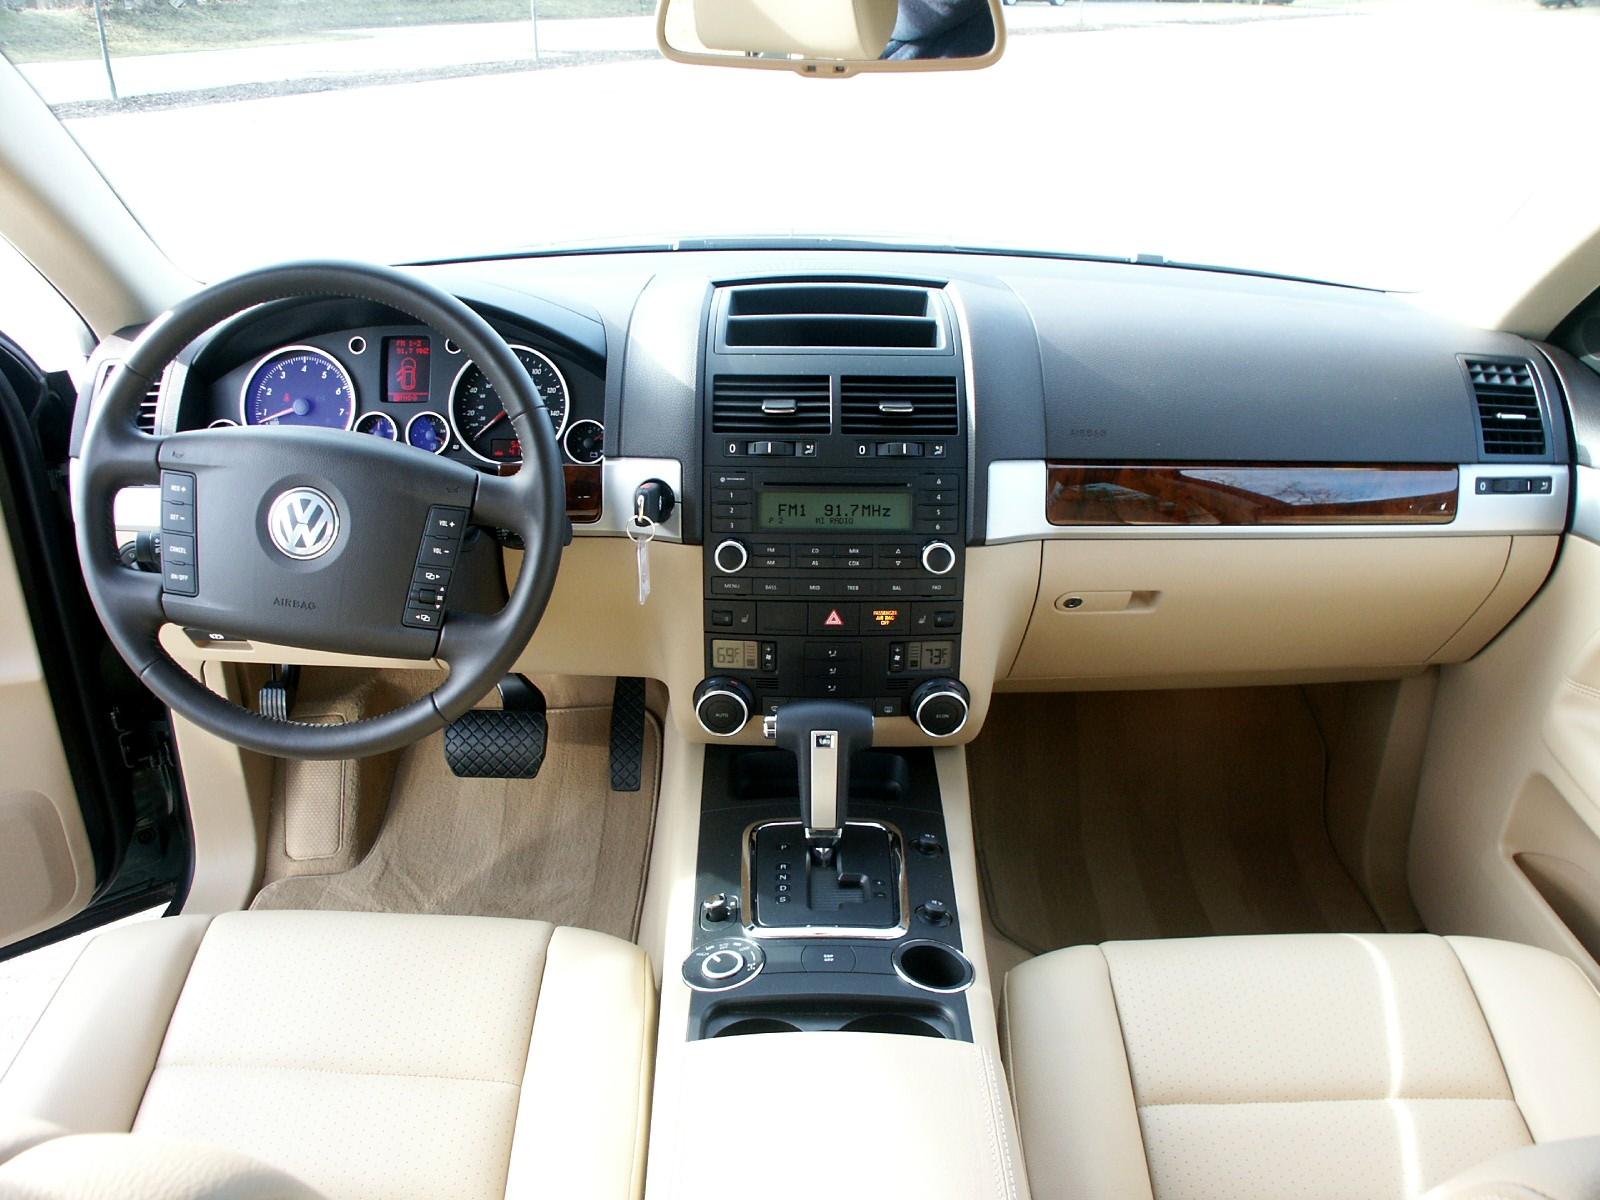 2007 Volkswagen Touareg - Partsopen